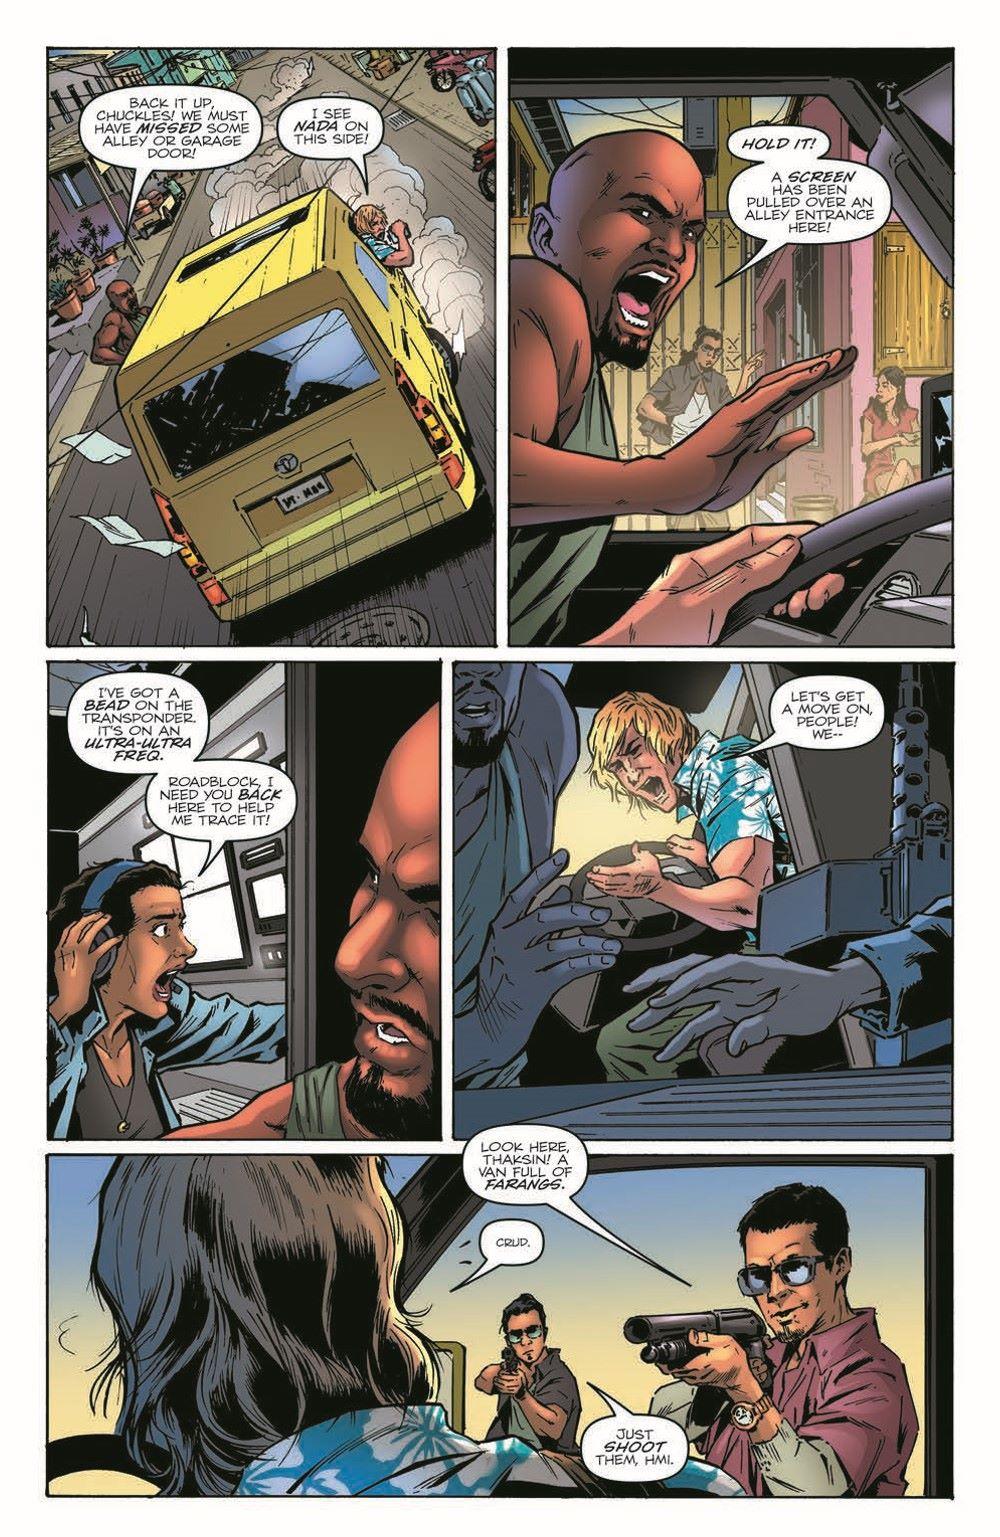 GIJoeRAH283-pr-7 ComicList Previews: G.I. JOE A REAL AMERICAN HERO #283